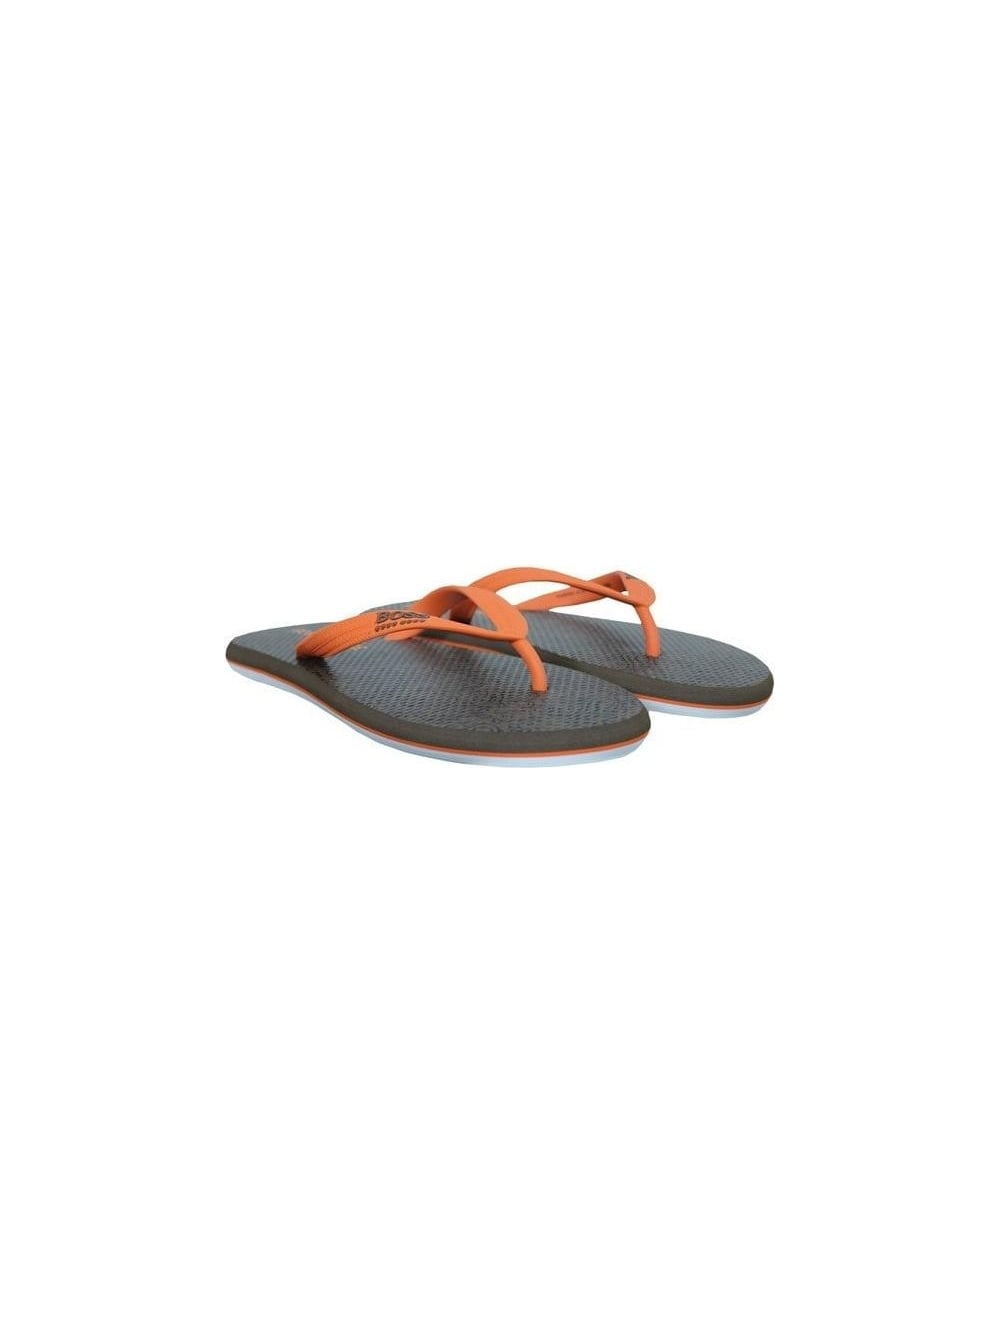 bfee21c0aac7 Hugo Boss Orange Waikkon Flip Flops in Medium Orange - Northern Threads